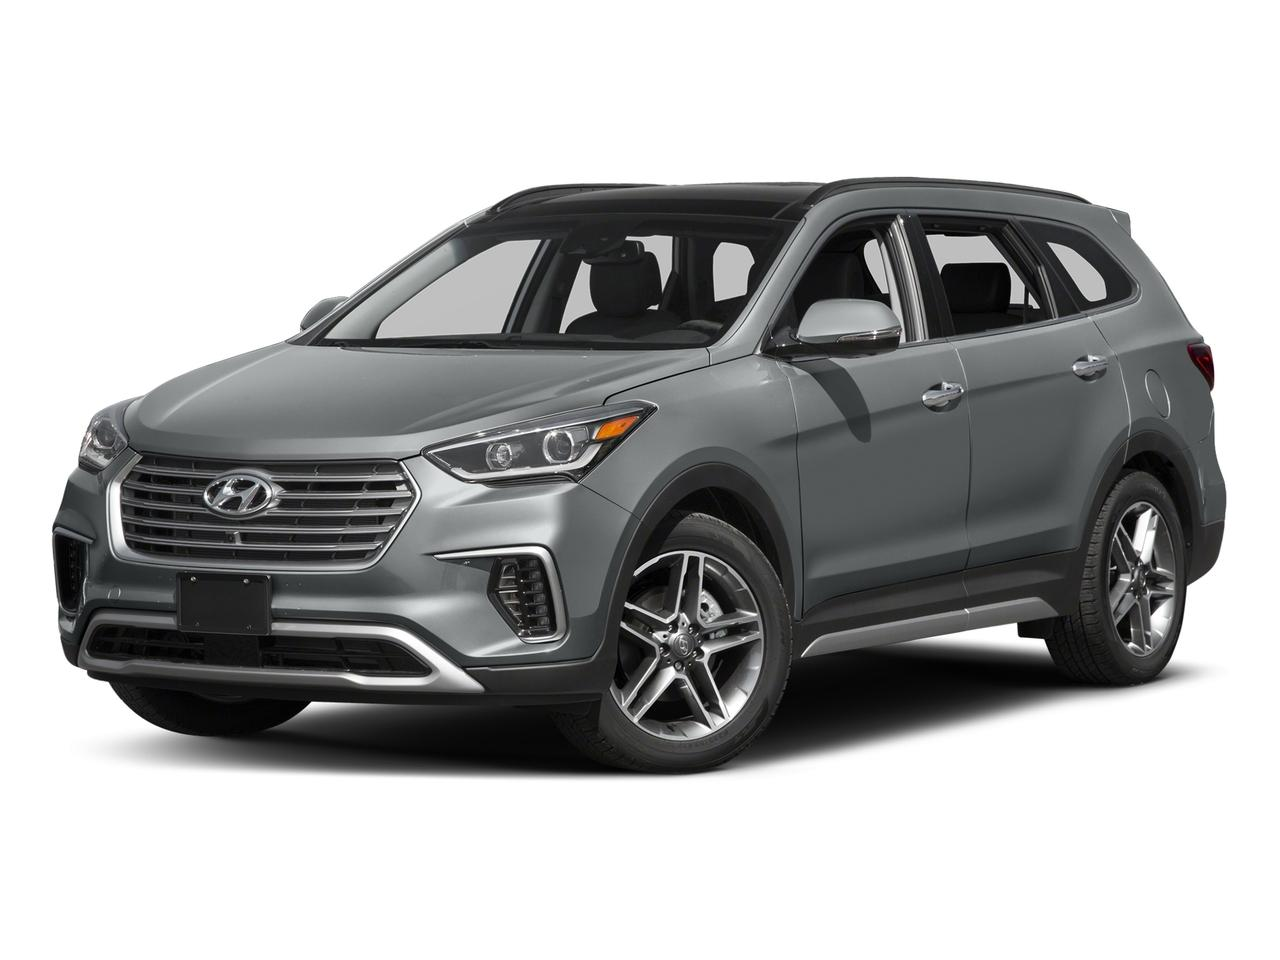 2017 Hyundai Santa Fe Vehicle Photo in Peoria, IL 61615